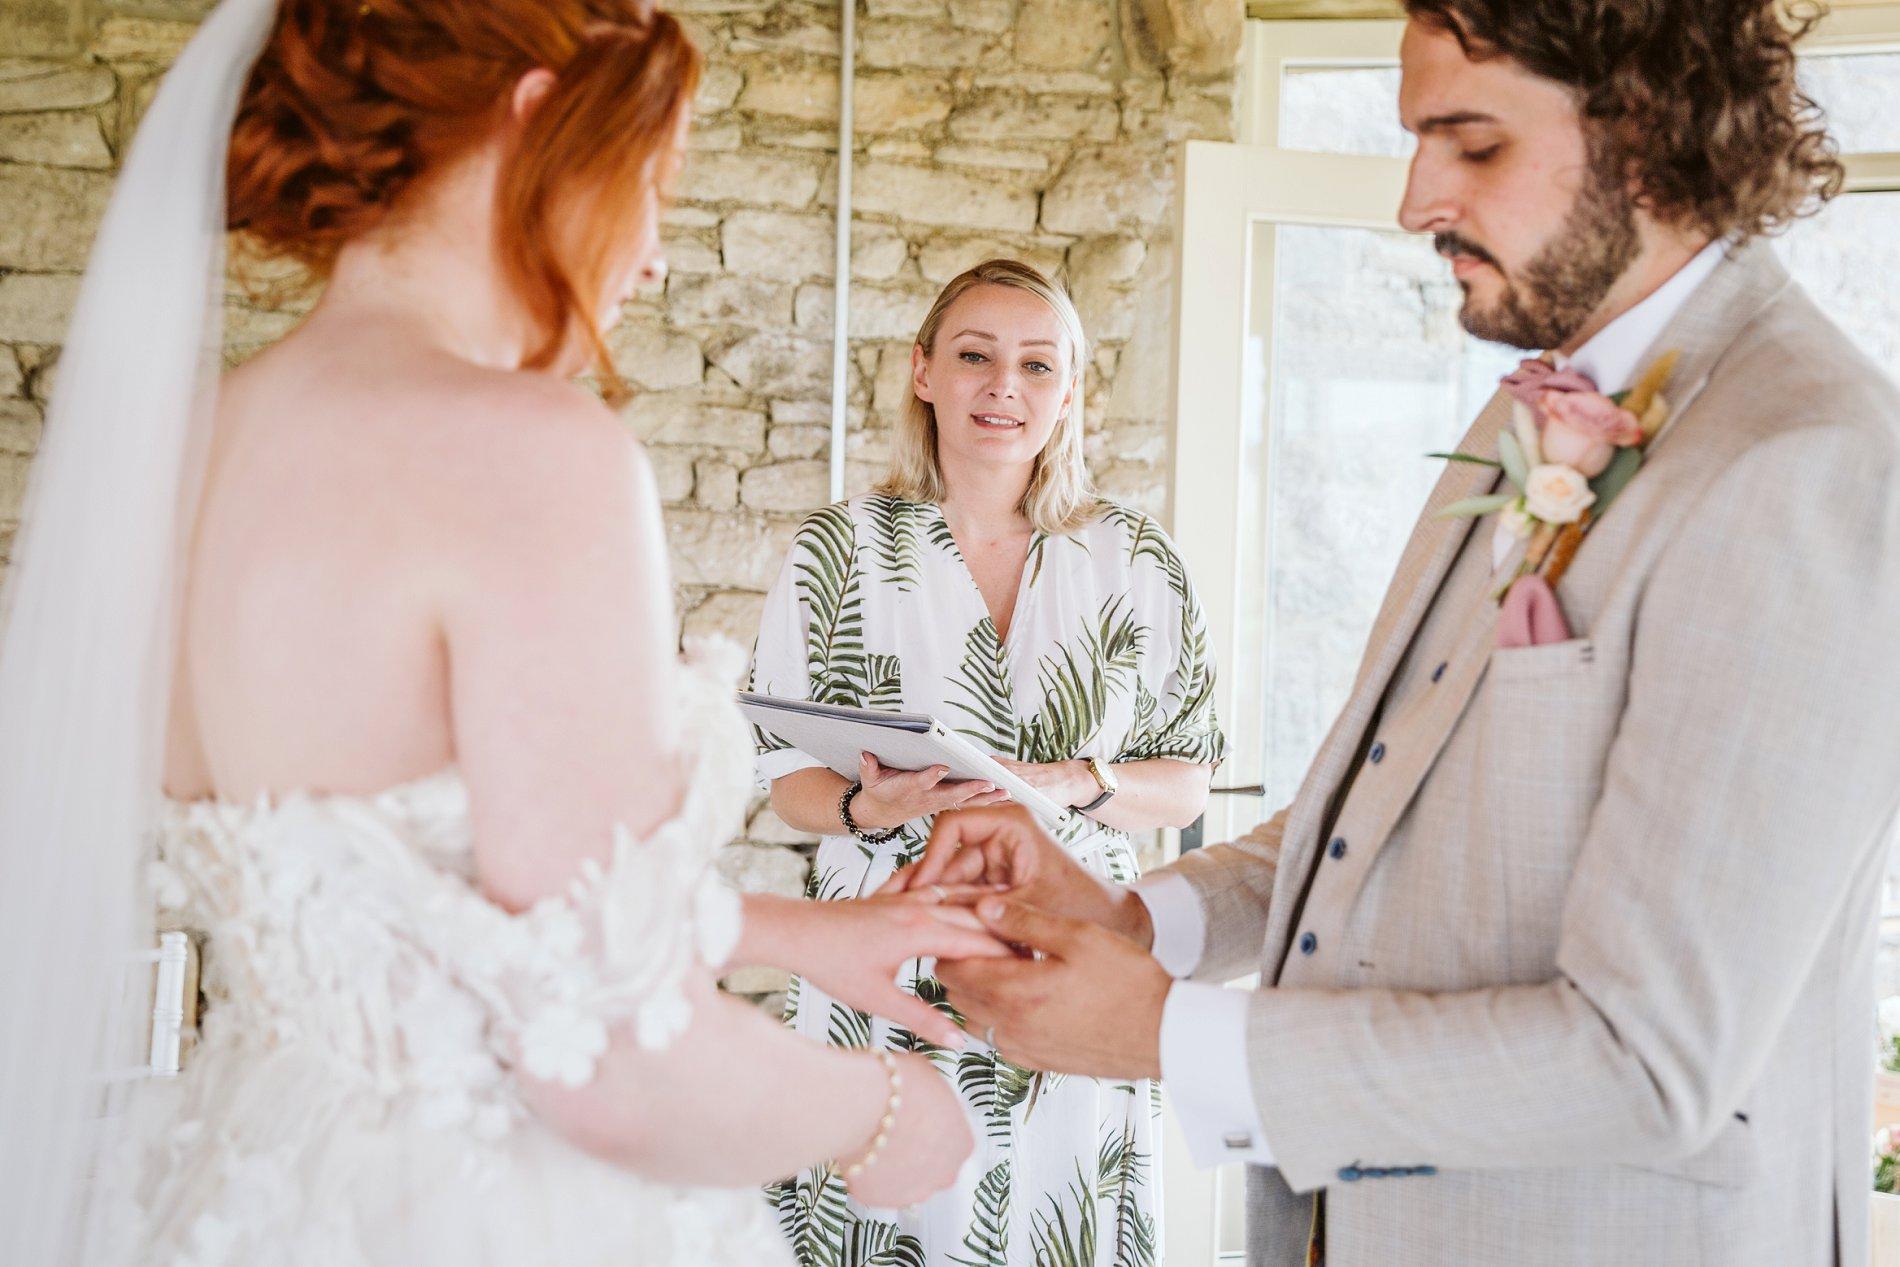 Saying I Do Rustic Wedding Creative Shoot (c) Charlotte Eve Photography (16)